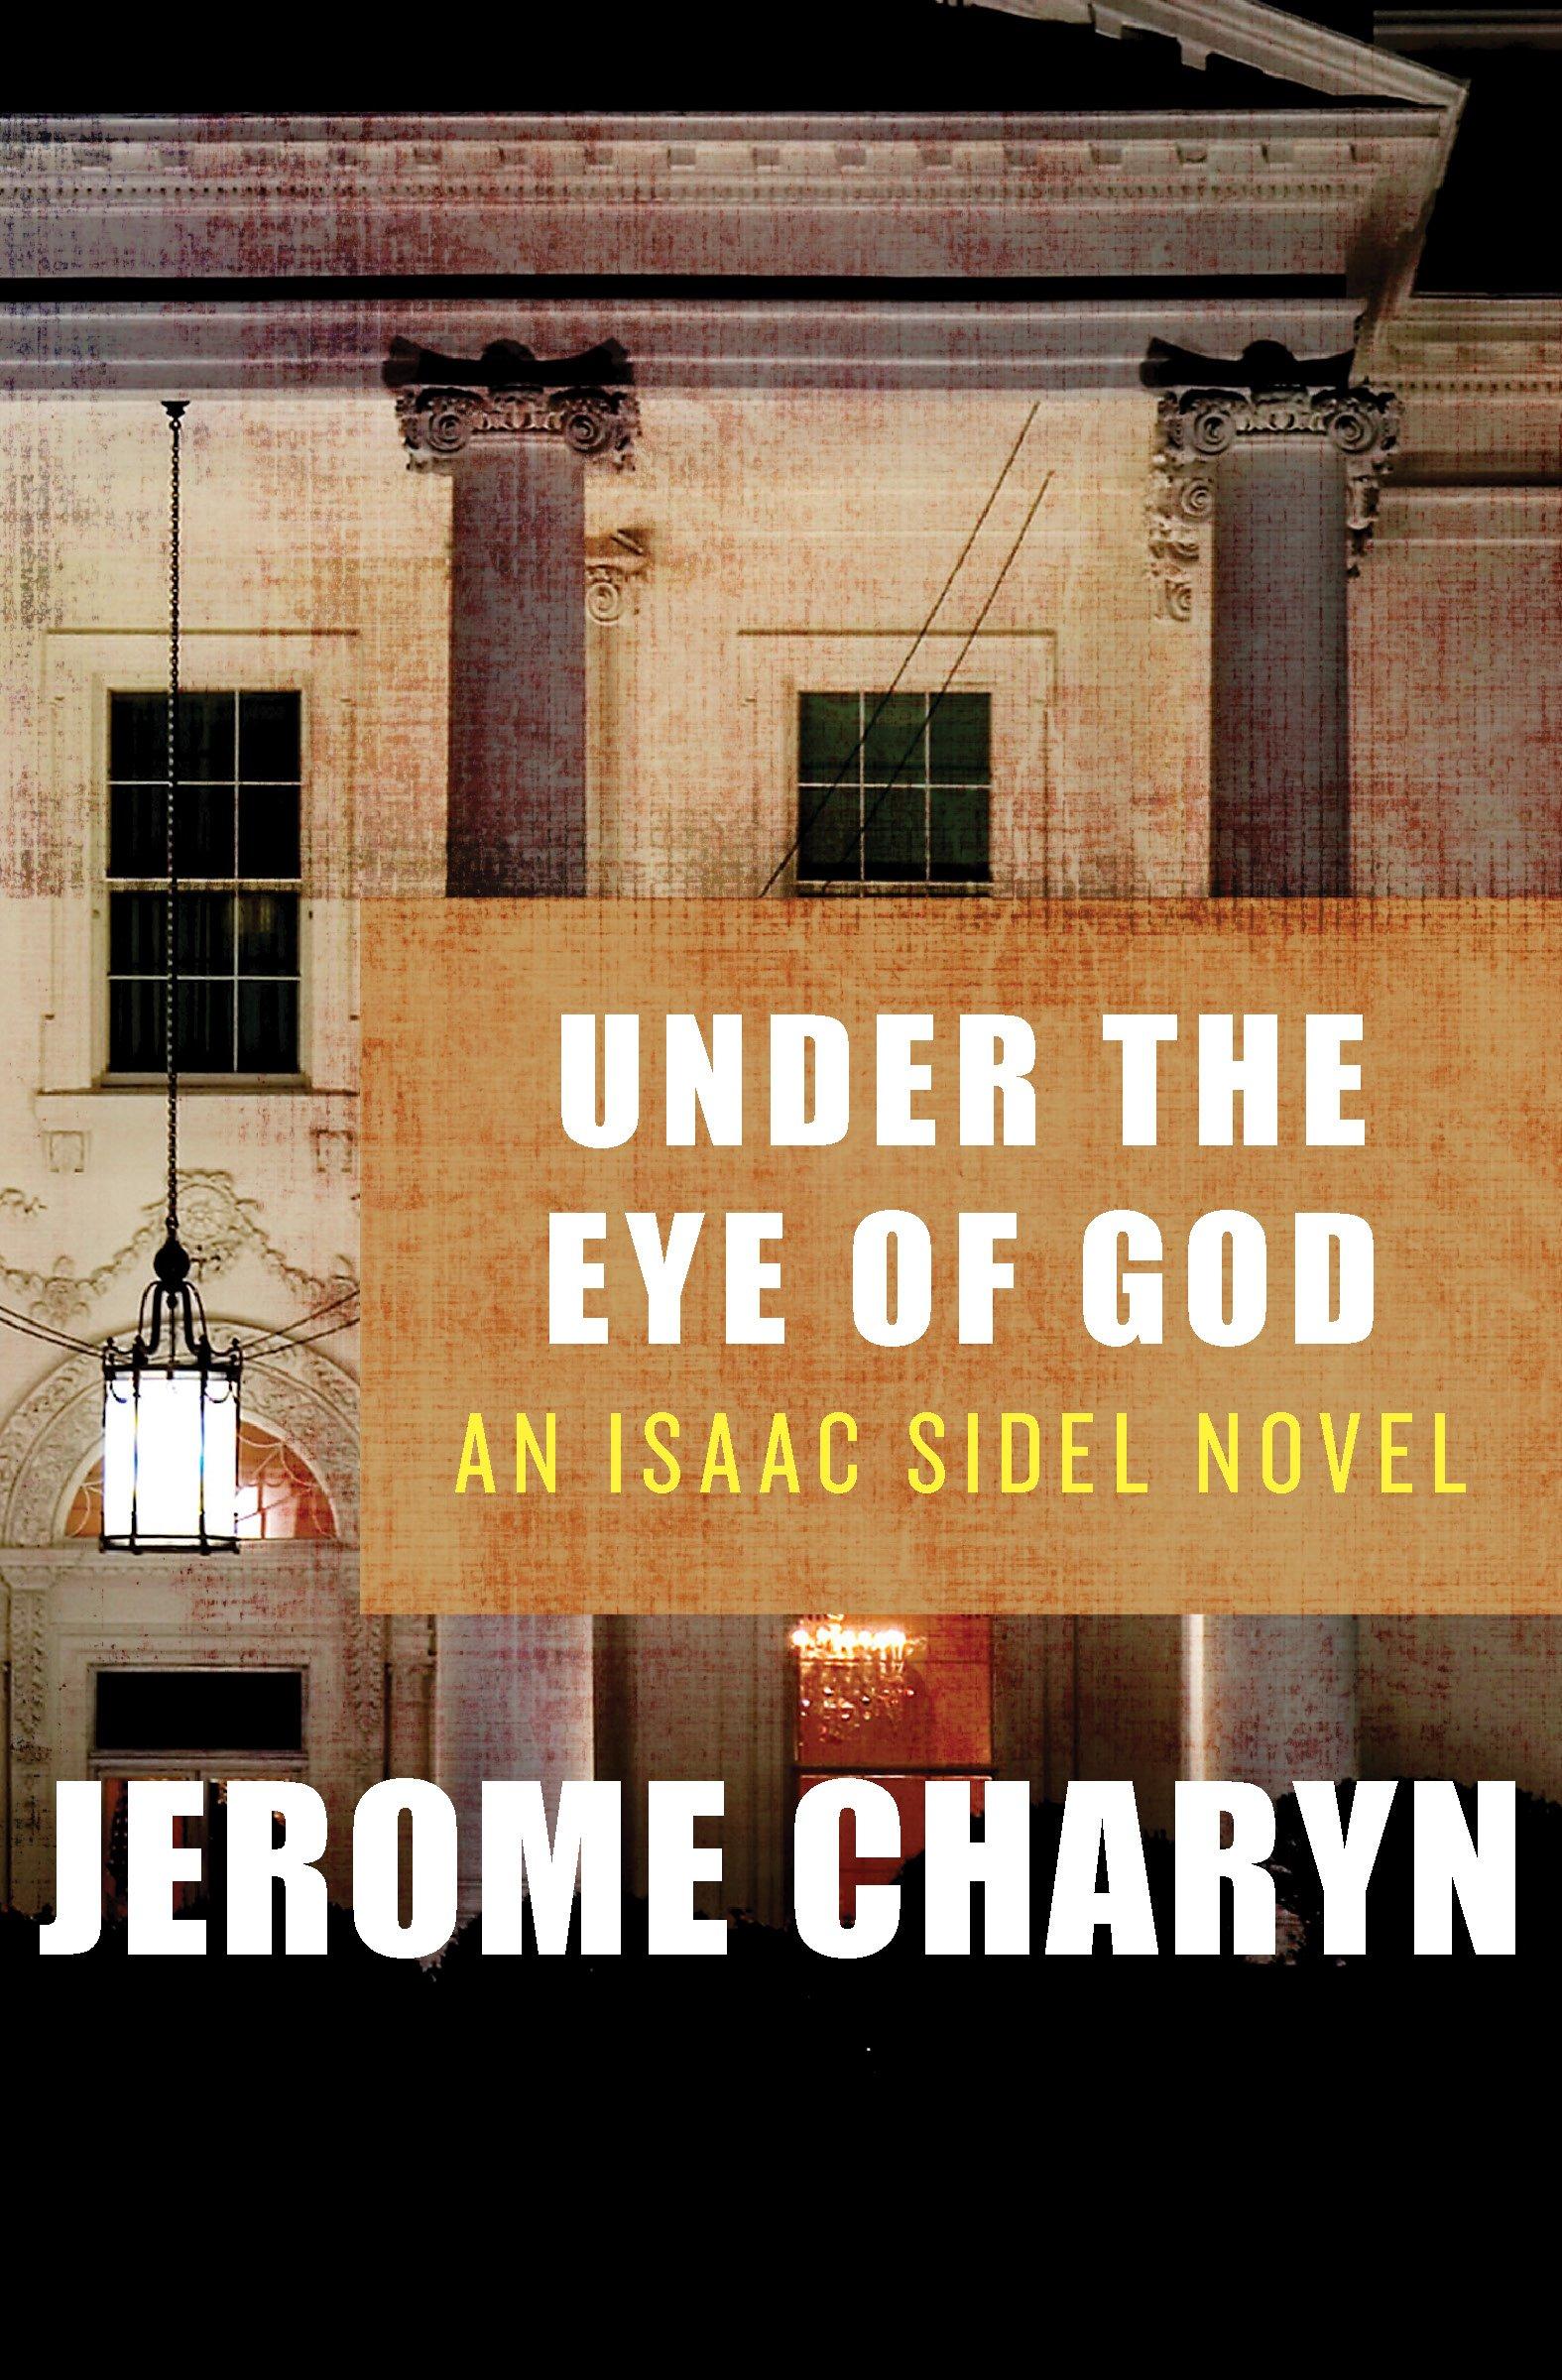 Read Online Under the Eye of God: An Isaac Sidel Novel (The Isaac Sidel Novels) pdf epub